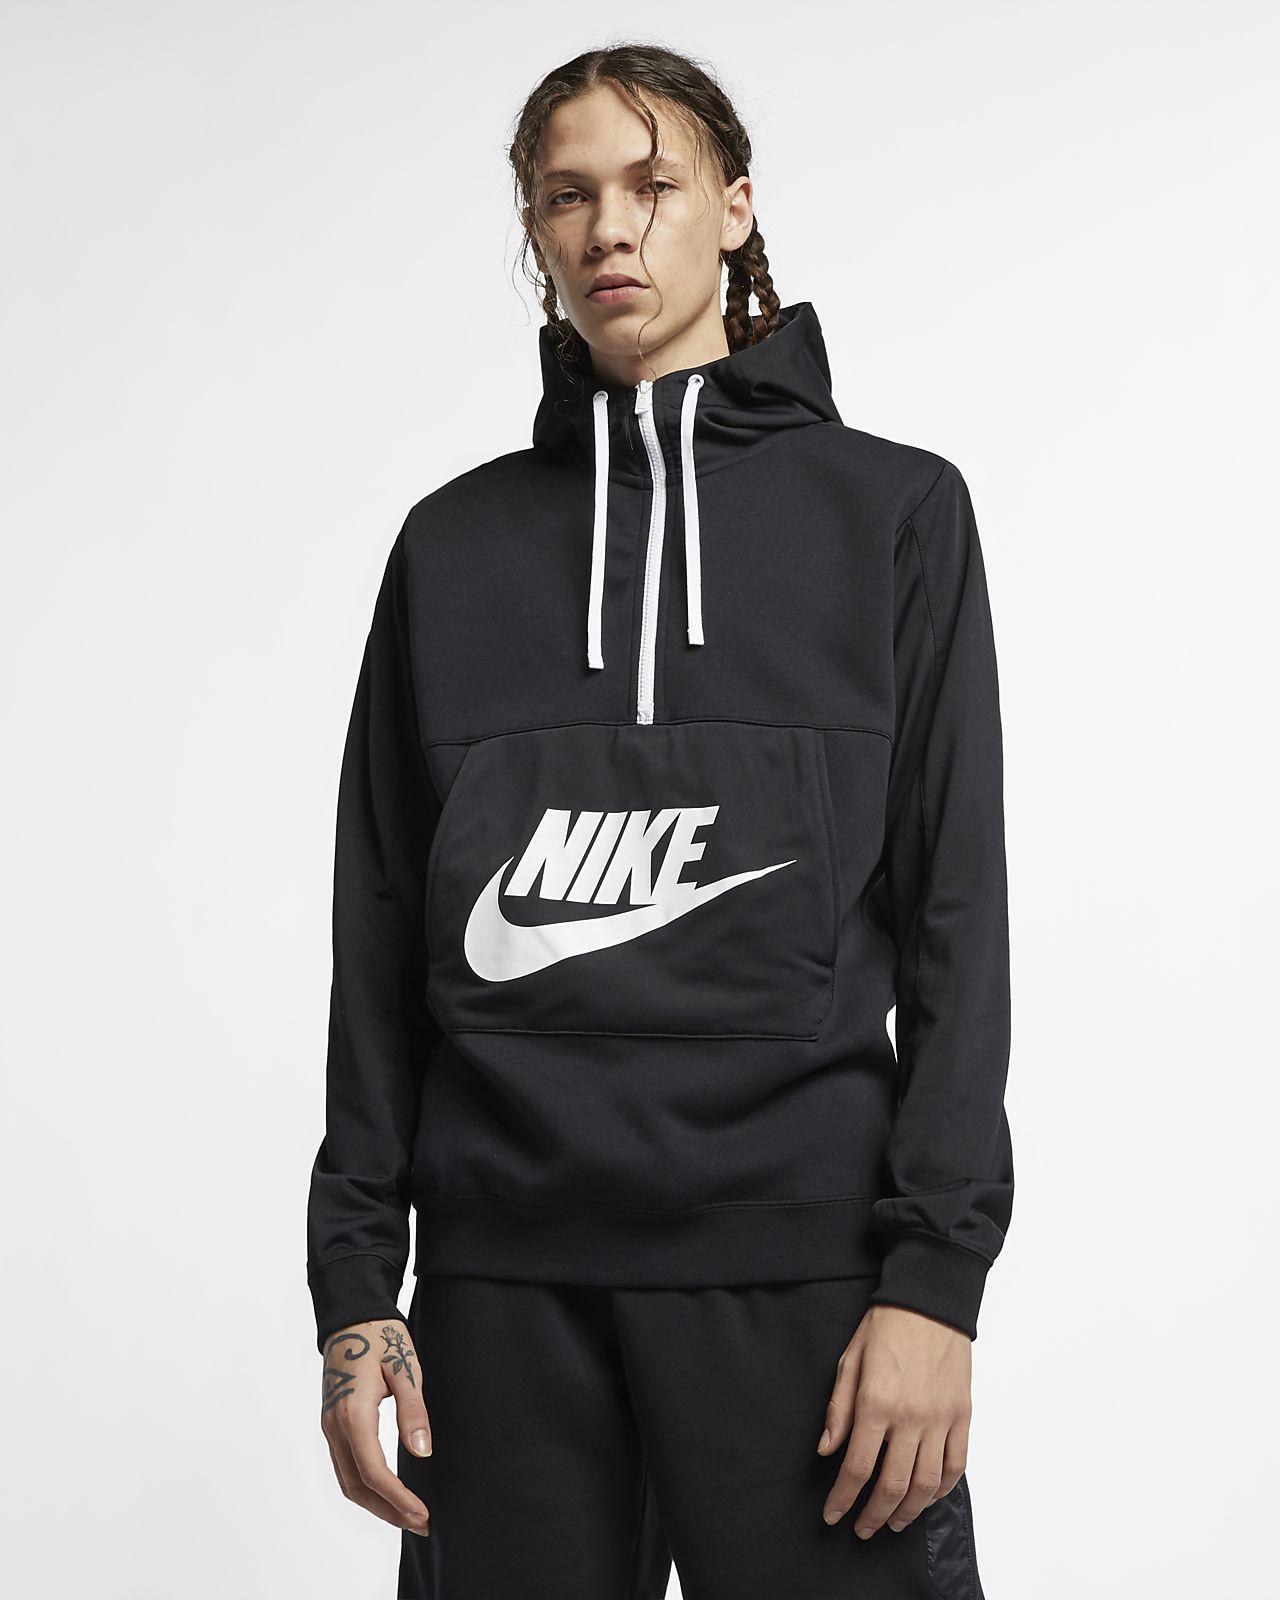 Nike Sportswear Men's 1/2-Zip Hoodie